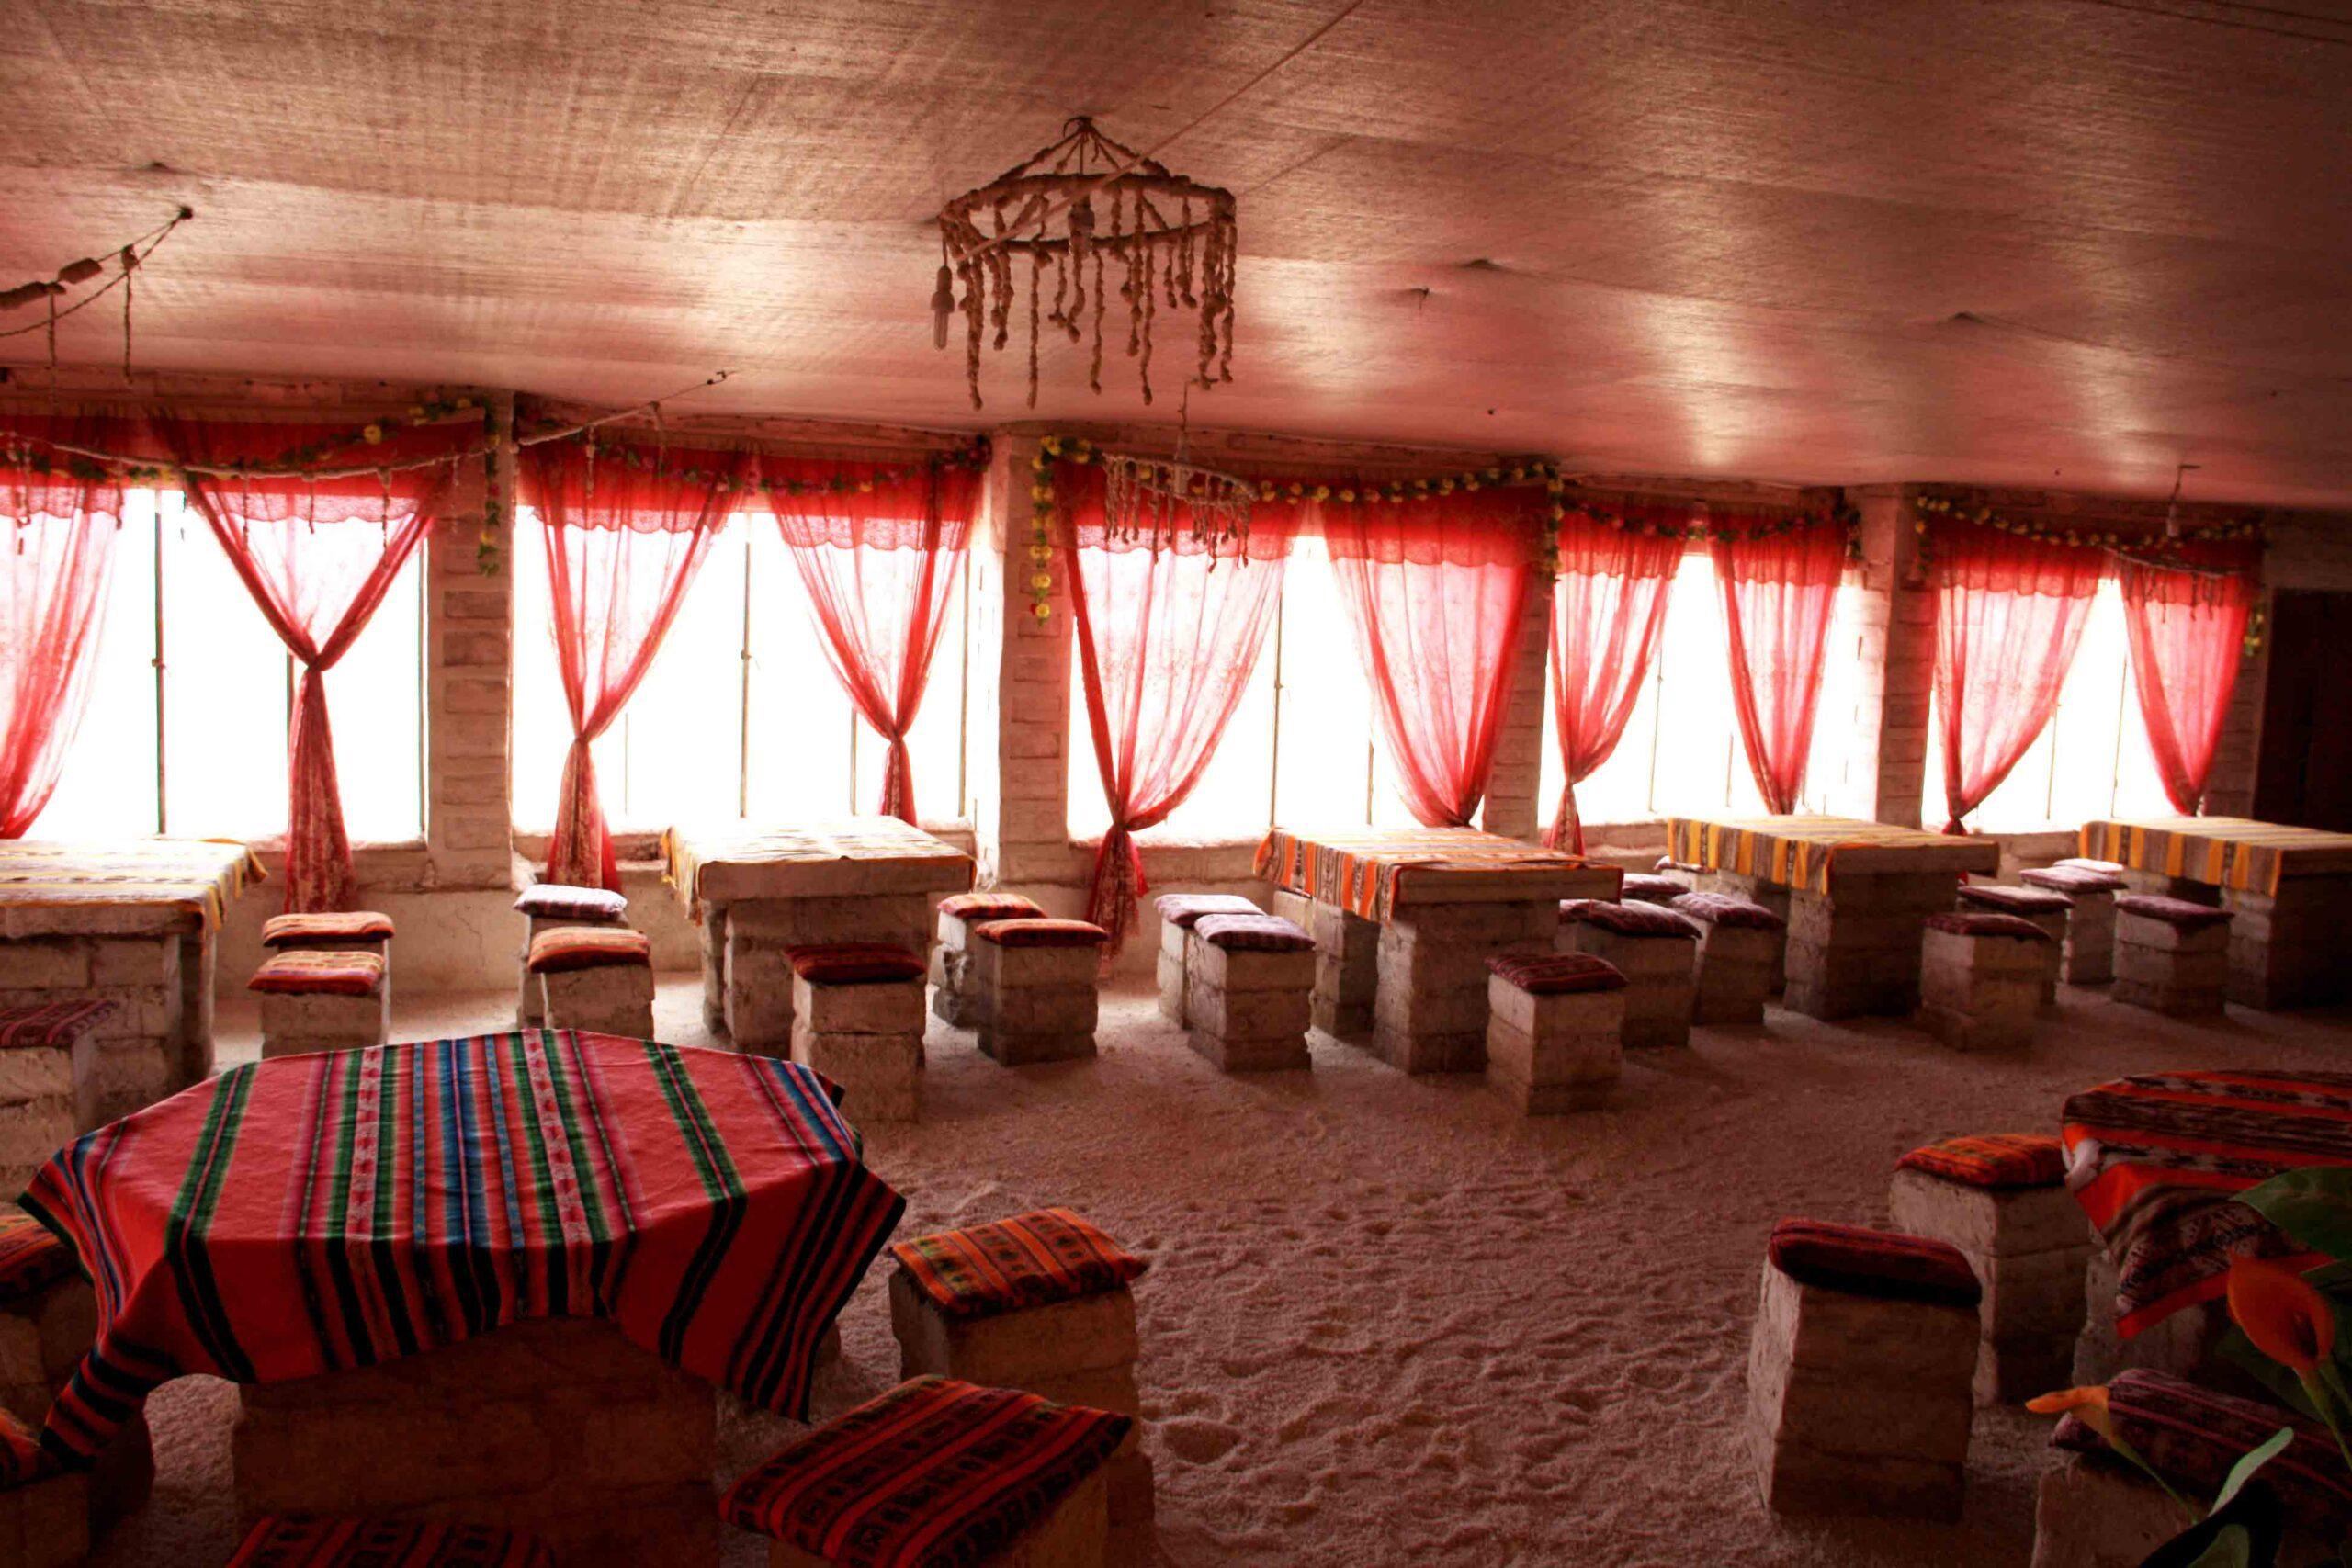 Salt hotel in Uyuni Bolivia